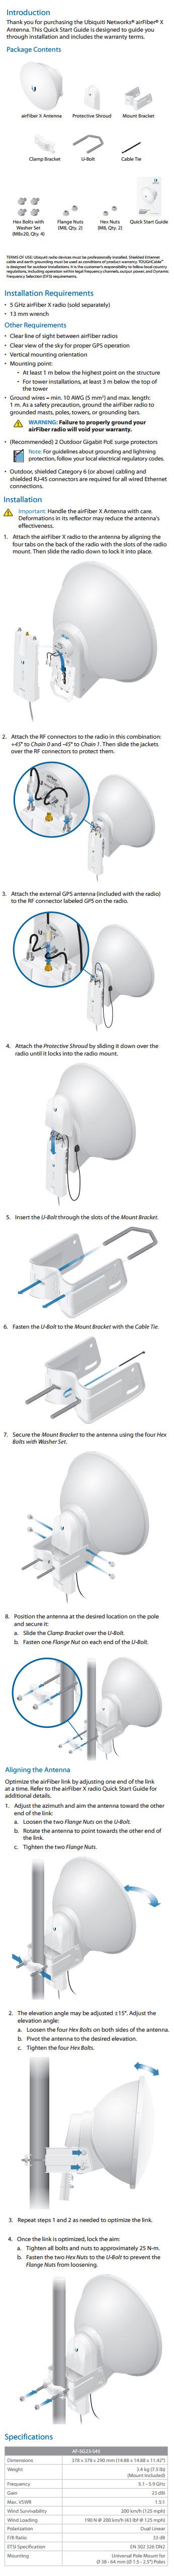 Ubiquiti Networks airFiber X AF-5G23-S45 5GHz 23dBi Antenna Dish